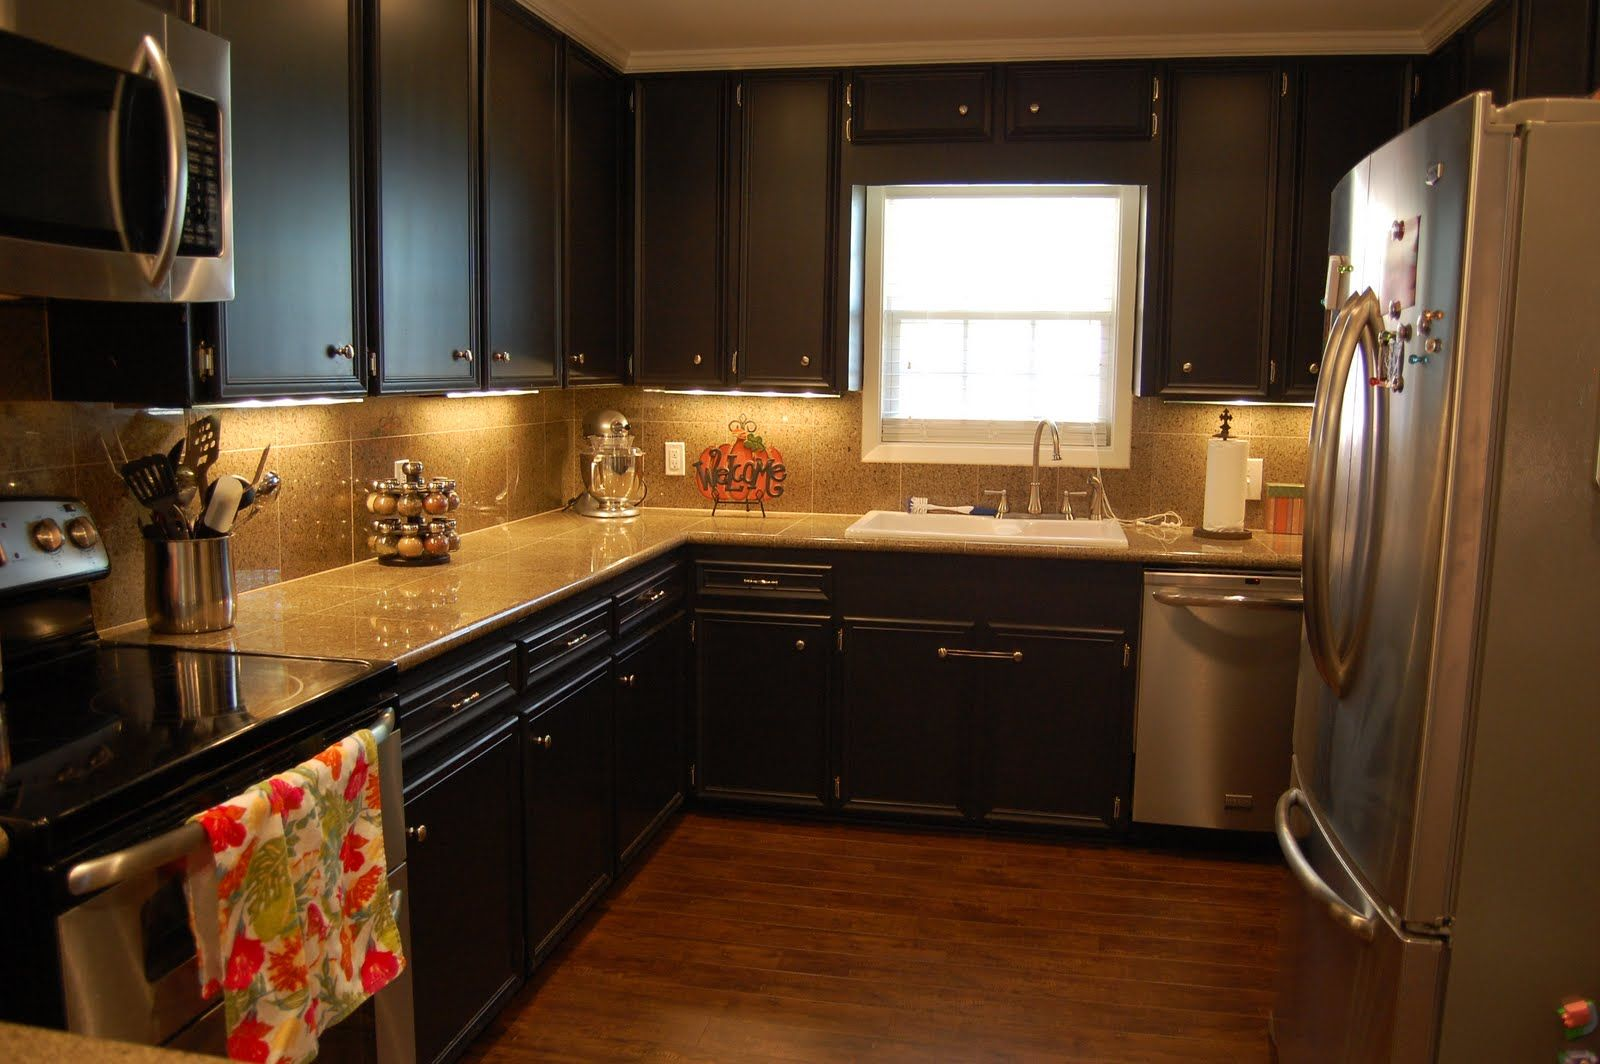 painted kitchen cabinets | Black kitchen cabinets, Kitchen ...